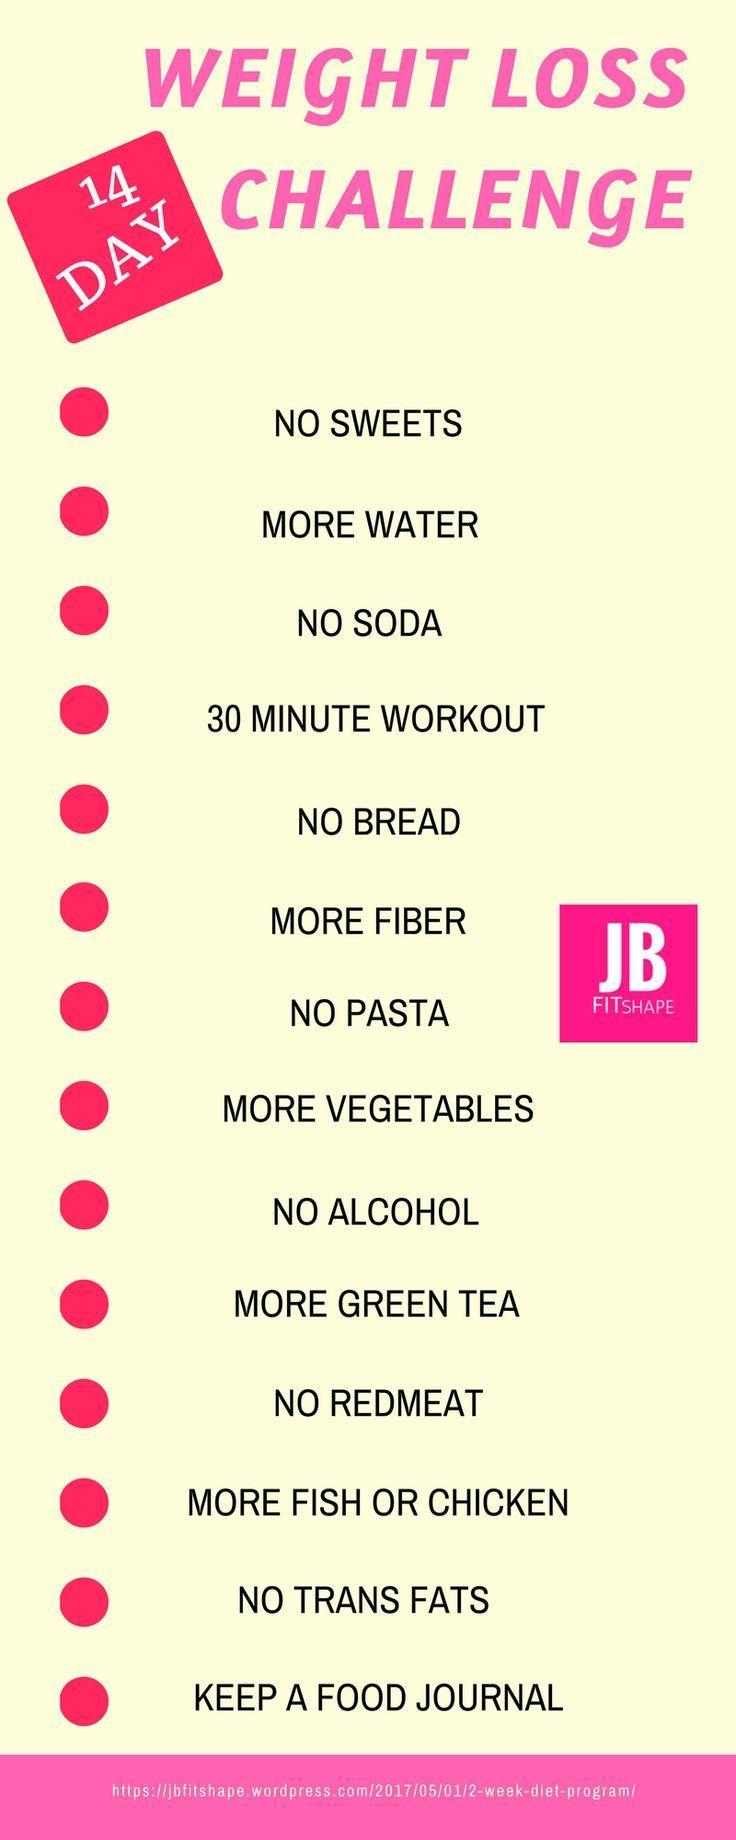 WEIGHT LOSS CHALLENGE !!🙊 #nosoda #nopasta #nobread #workout #morefiber